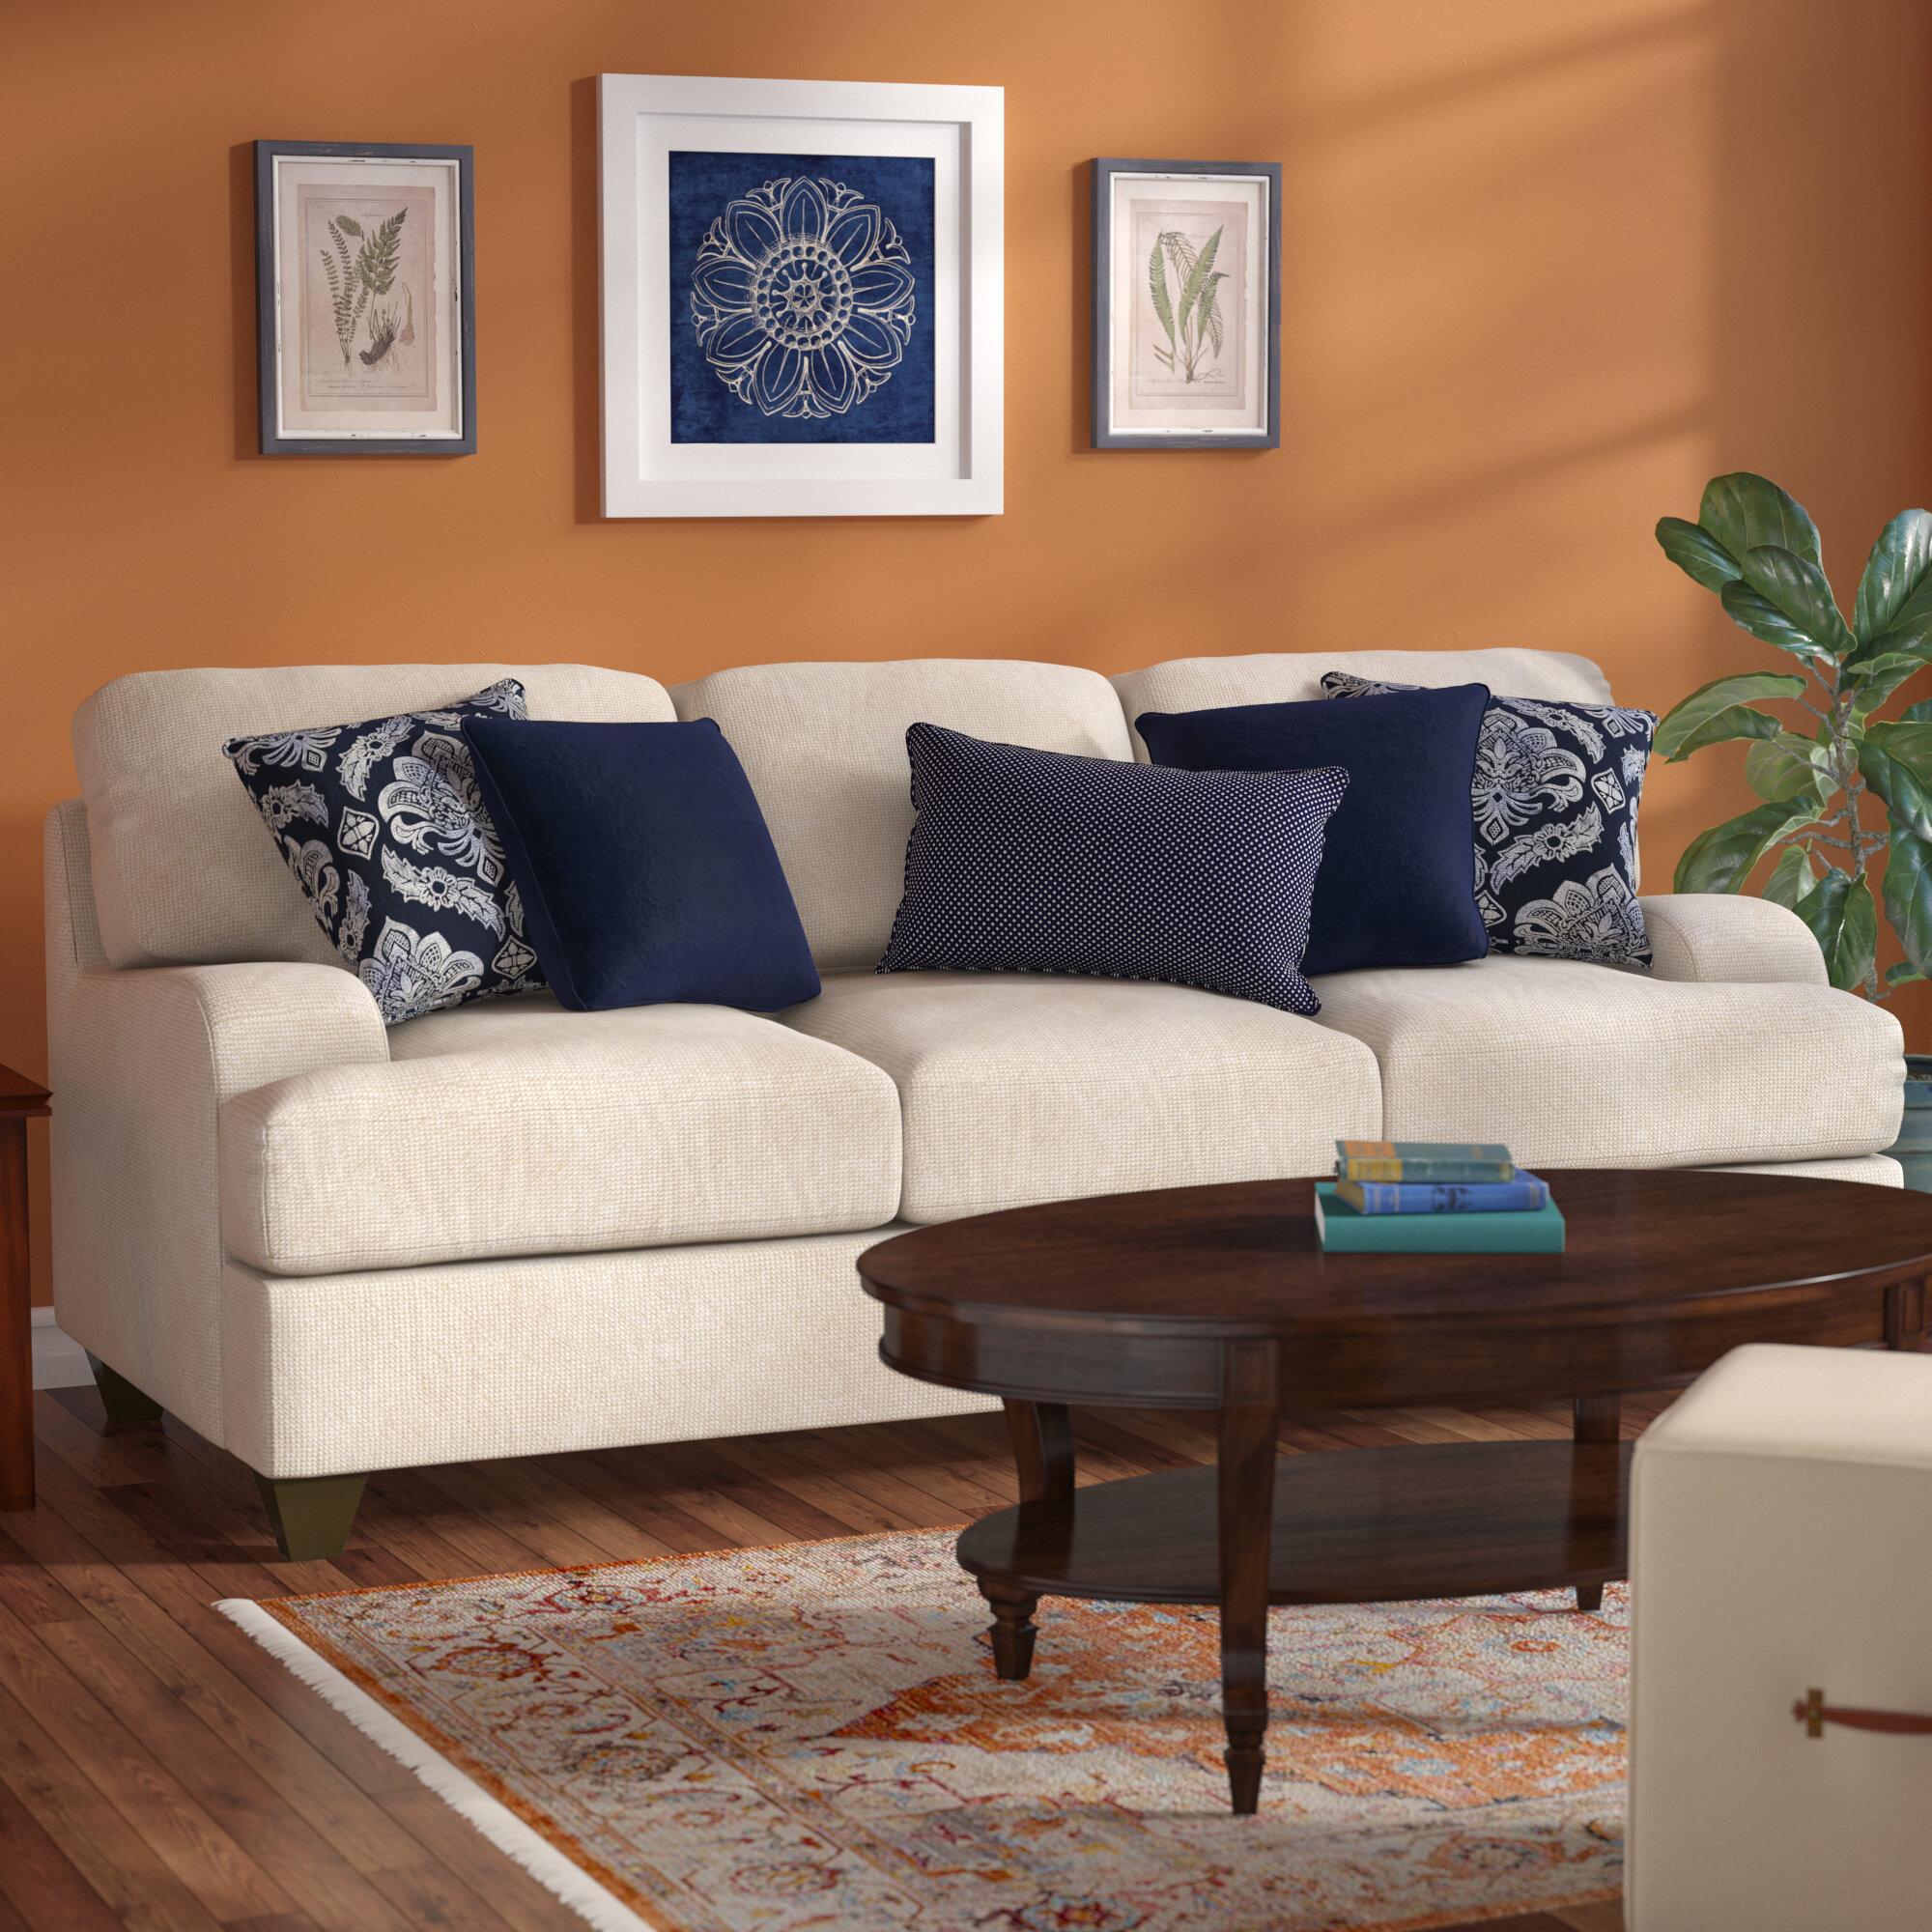 Three Posts Simmons Upholstery Hattiesburg Stone Queen Sleeper Sofa Reviews Wayfair